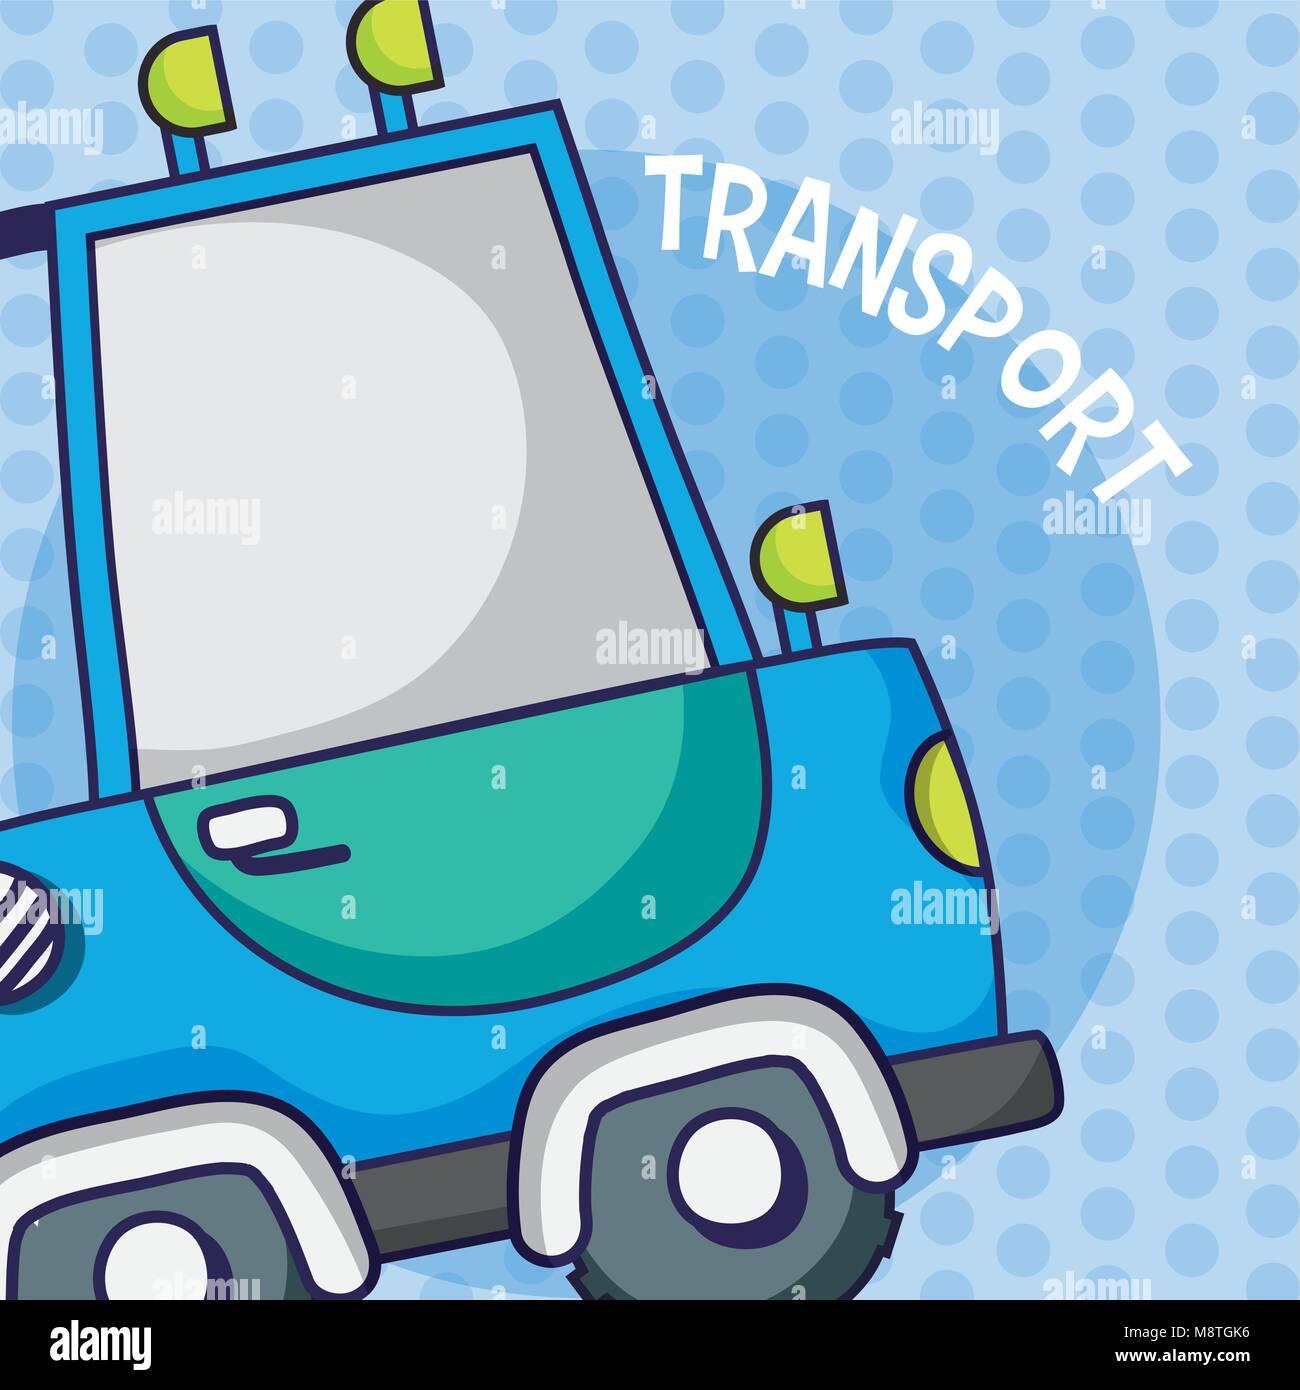 Suv Camioneta 4x4 Sobre Fondo De Colores Imagen Vector De Stock Alamy